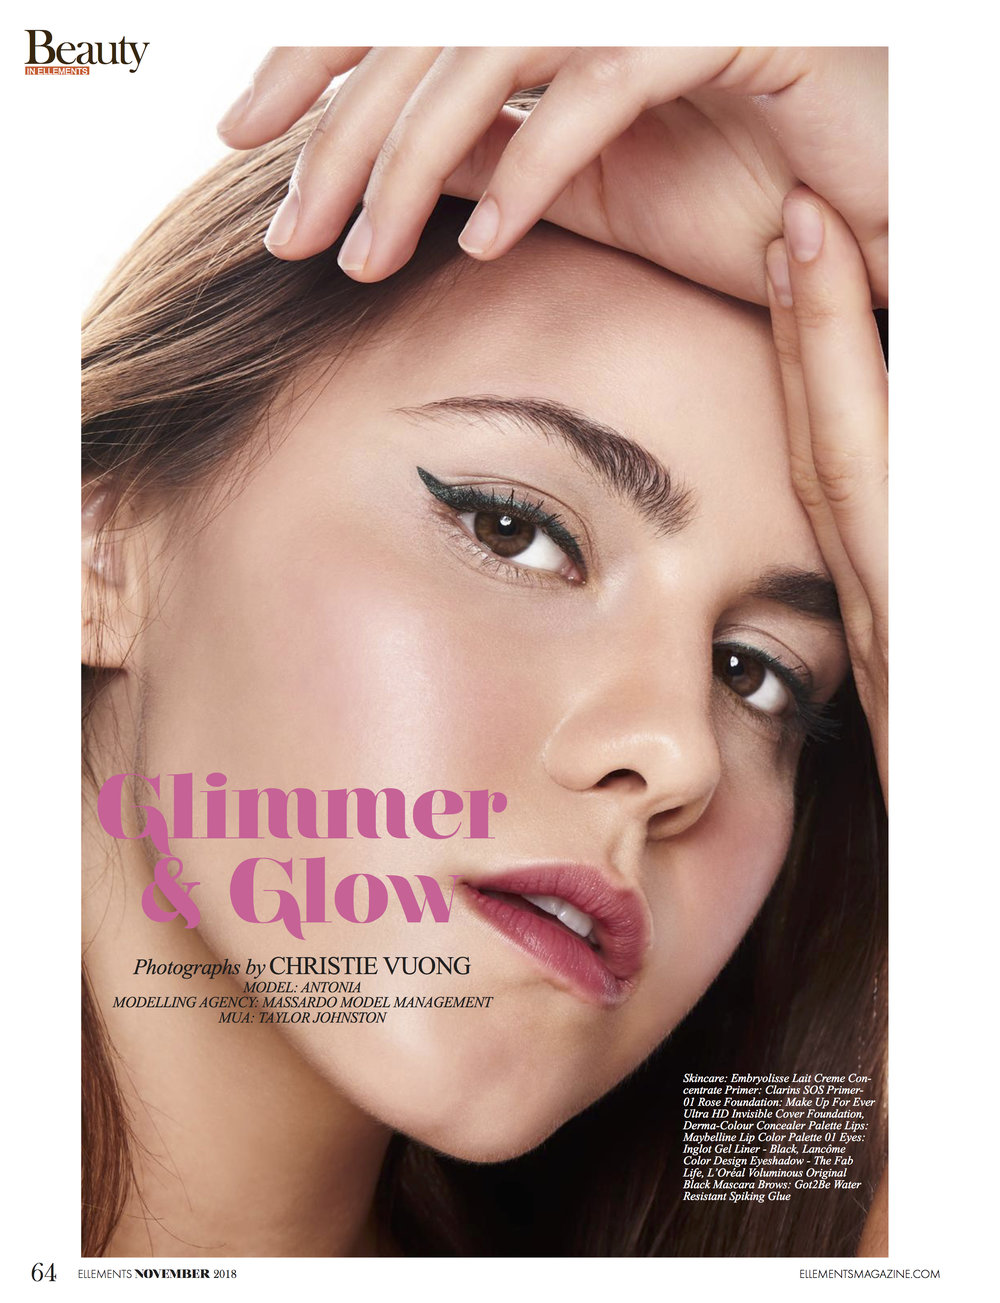 Elléments Magazine - Glimmer & Glow